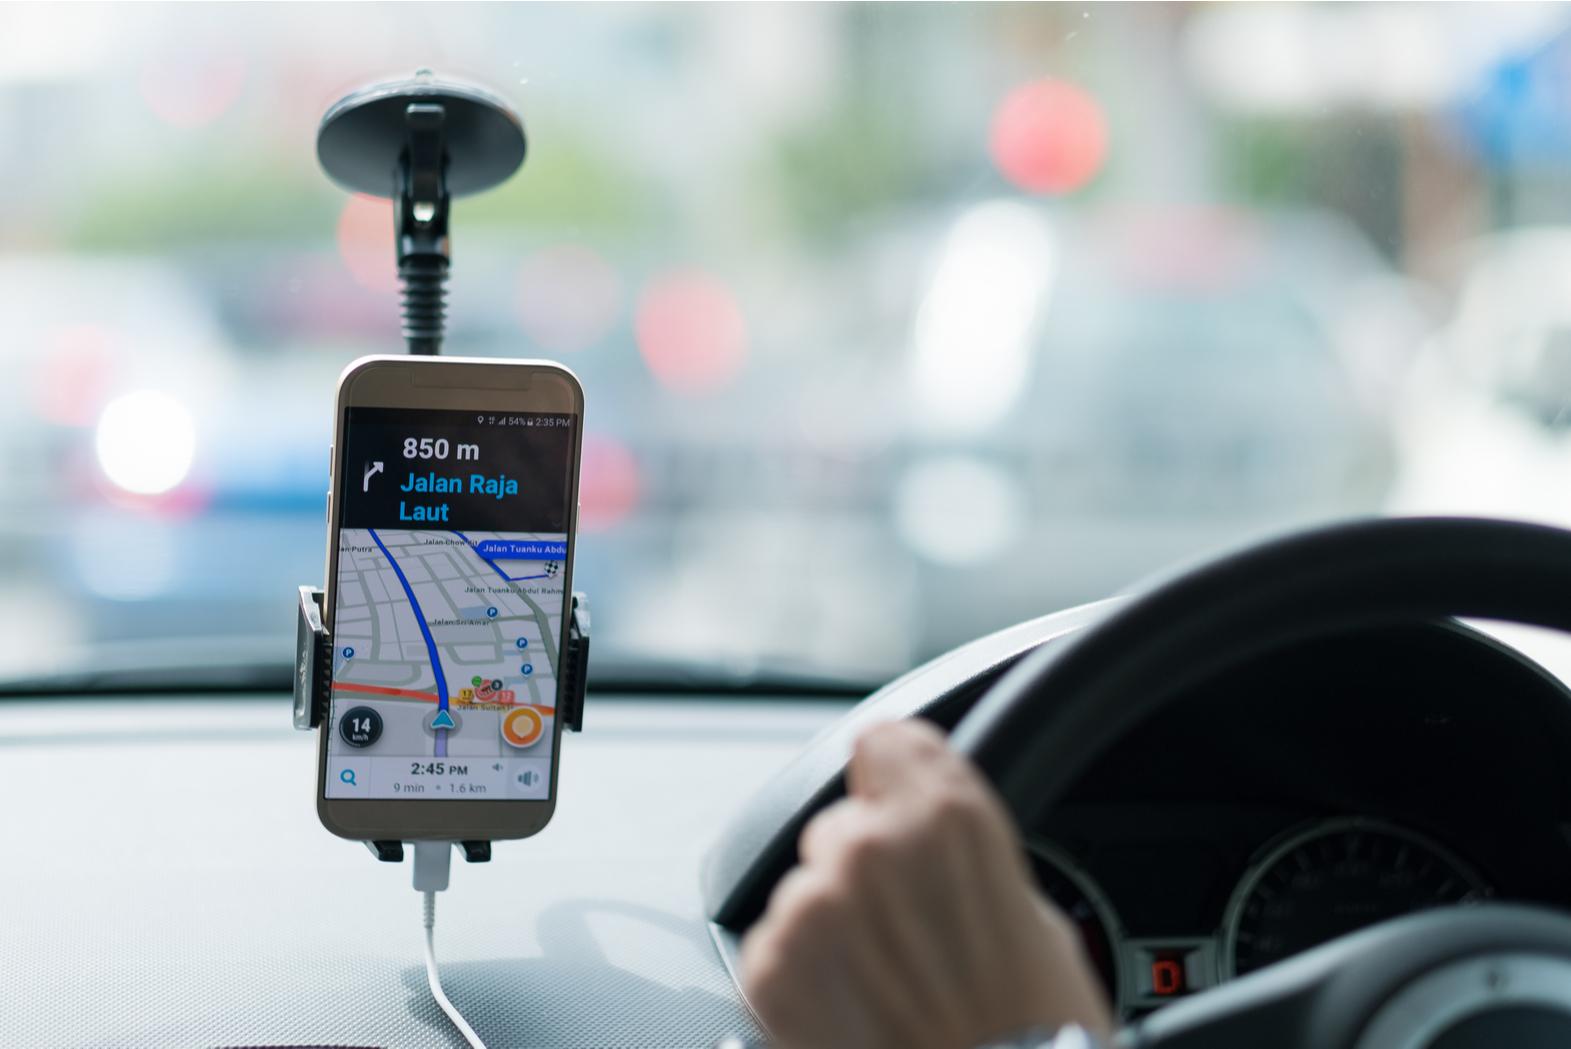 SoftBank boosts funds of car leasing app Fair